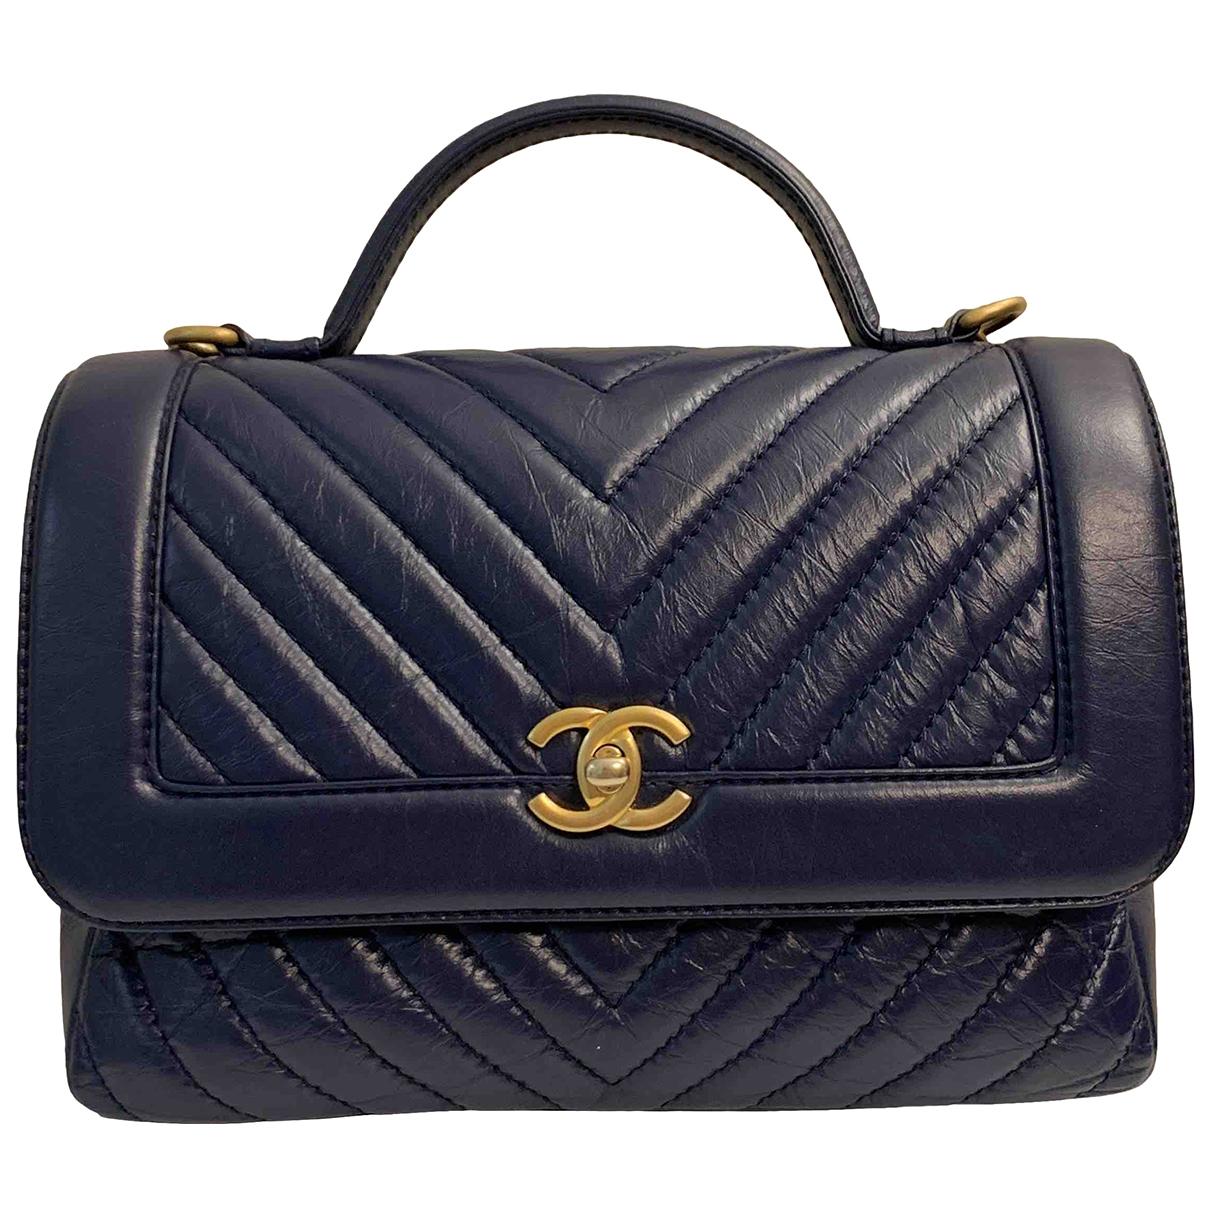 Chanel Coco Handle Handtasche in  Blau Leder